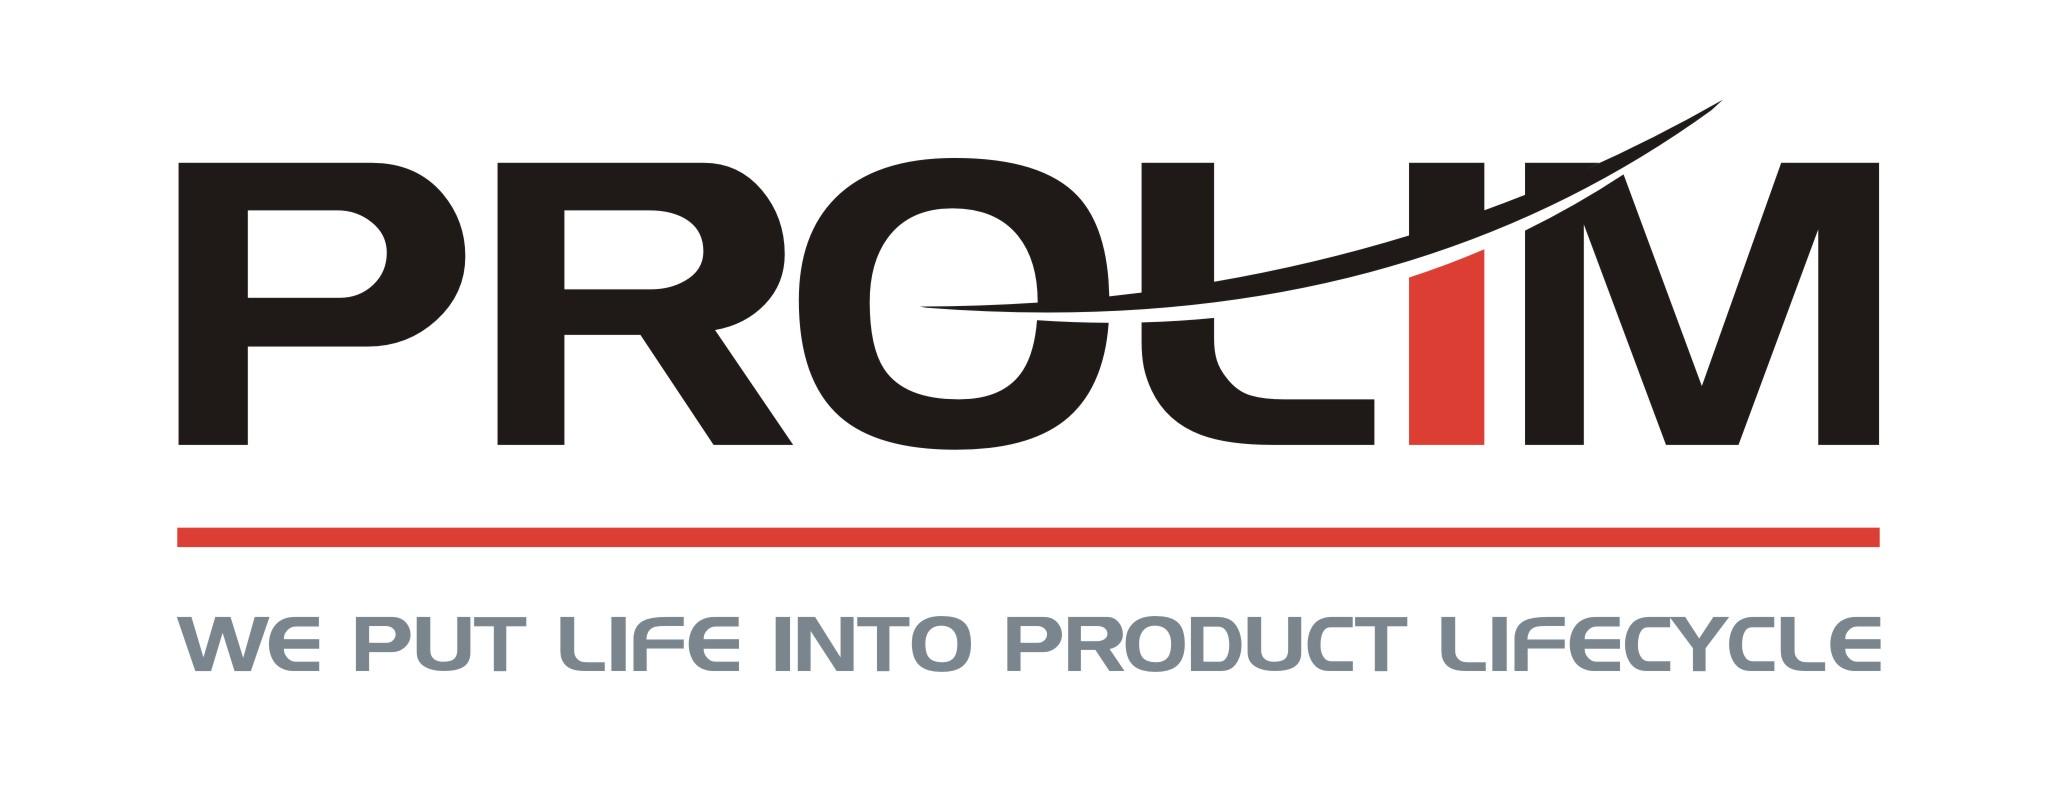 PROLIM Celebrates its 10th Year Anniversary!